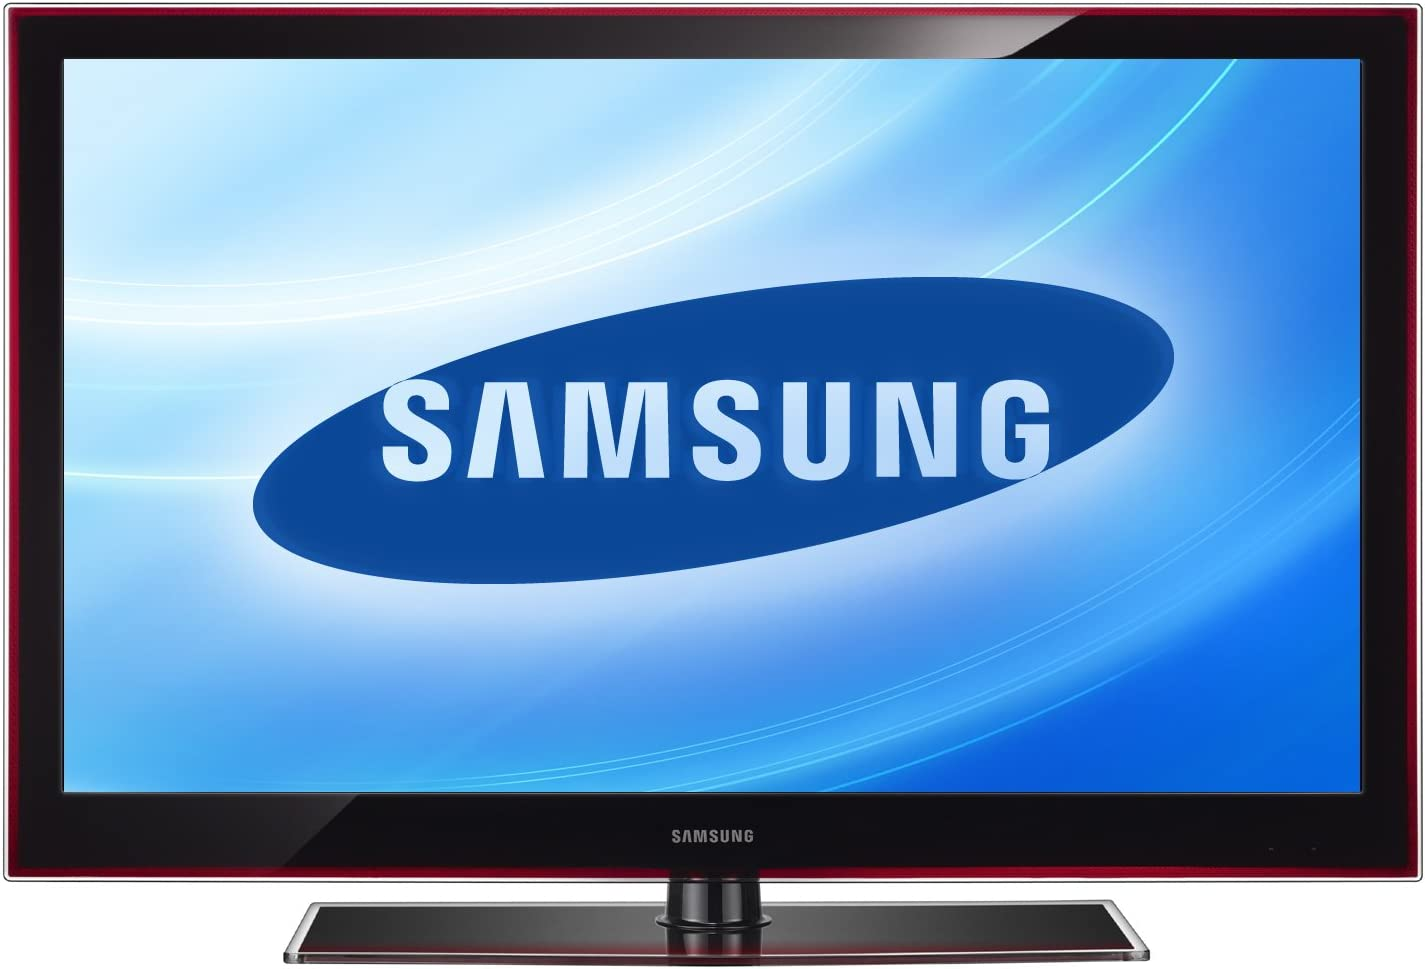 Samsung LE40 A 856 1 - Televisión Full HD, Pantalla LCD 40 pulgadas: Amazon.es: Electrónica